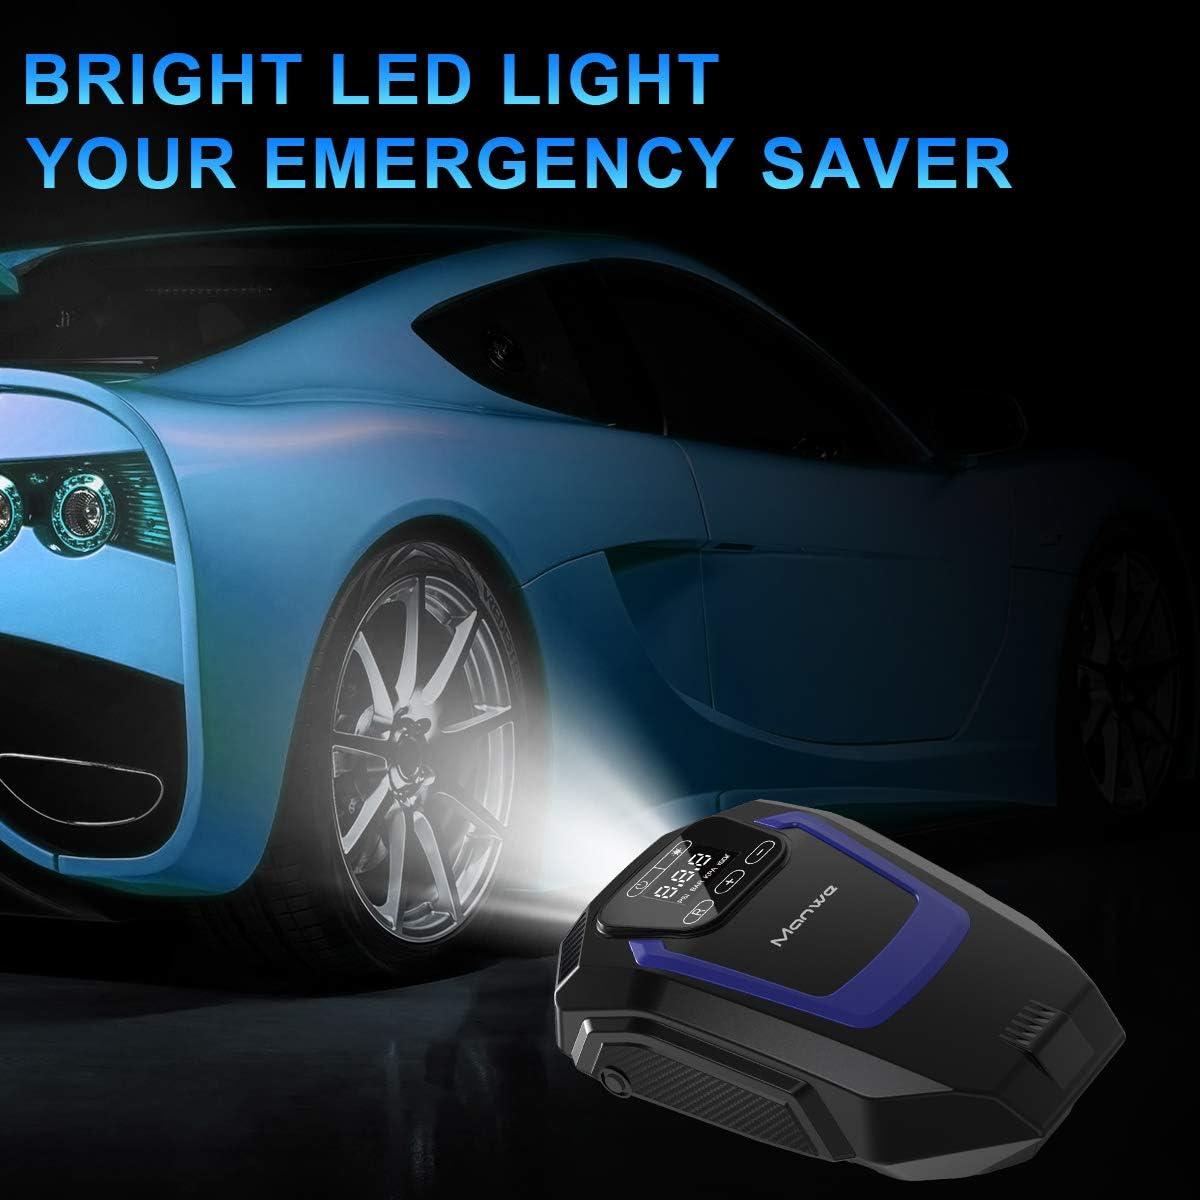 LED Flashlight DC 12V 150PSI Car Pump Tyre pump with Auto Shut Off Manwe Digital Tyre Inflator Touch Screen Tire Inflator 3 Nozzles,Valve Adaptors Portable Air Compressor Pump